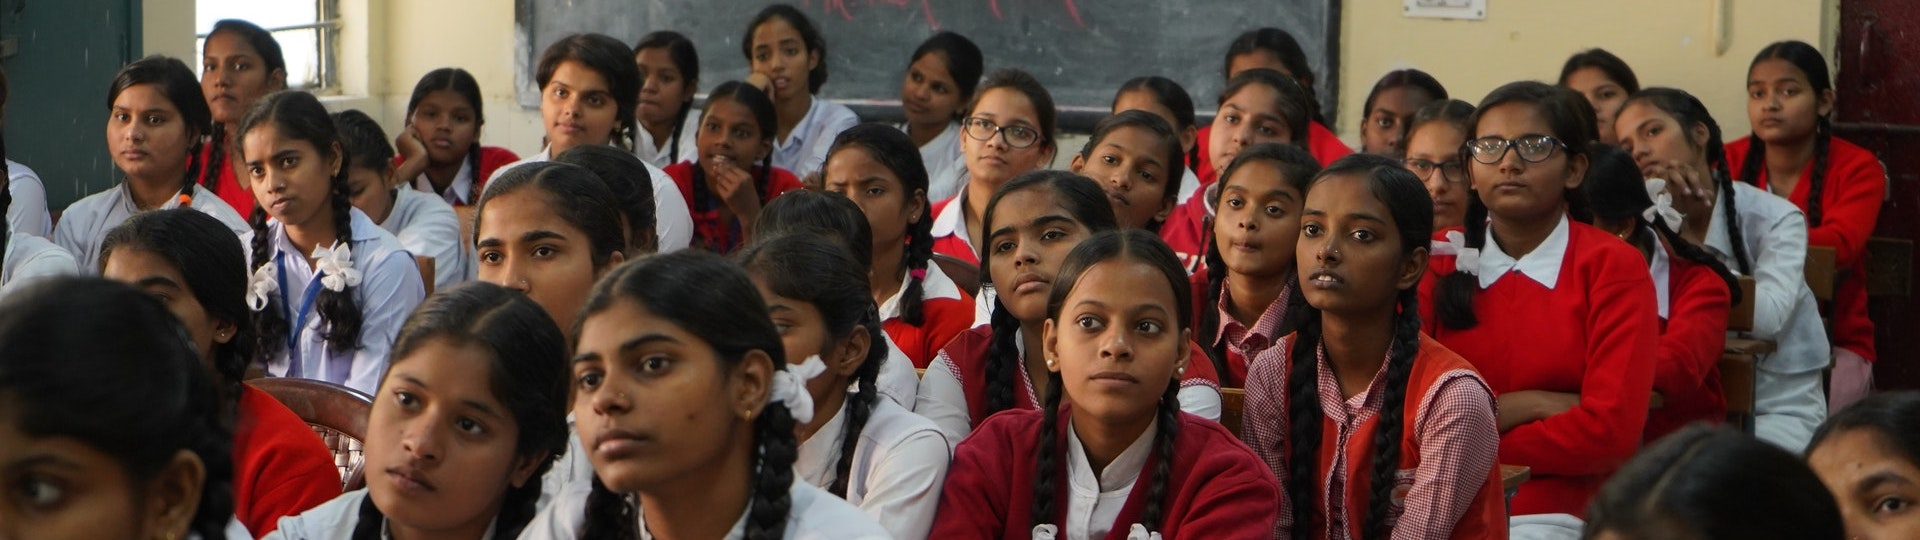 Classe de filles en Inde